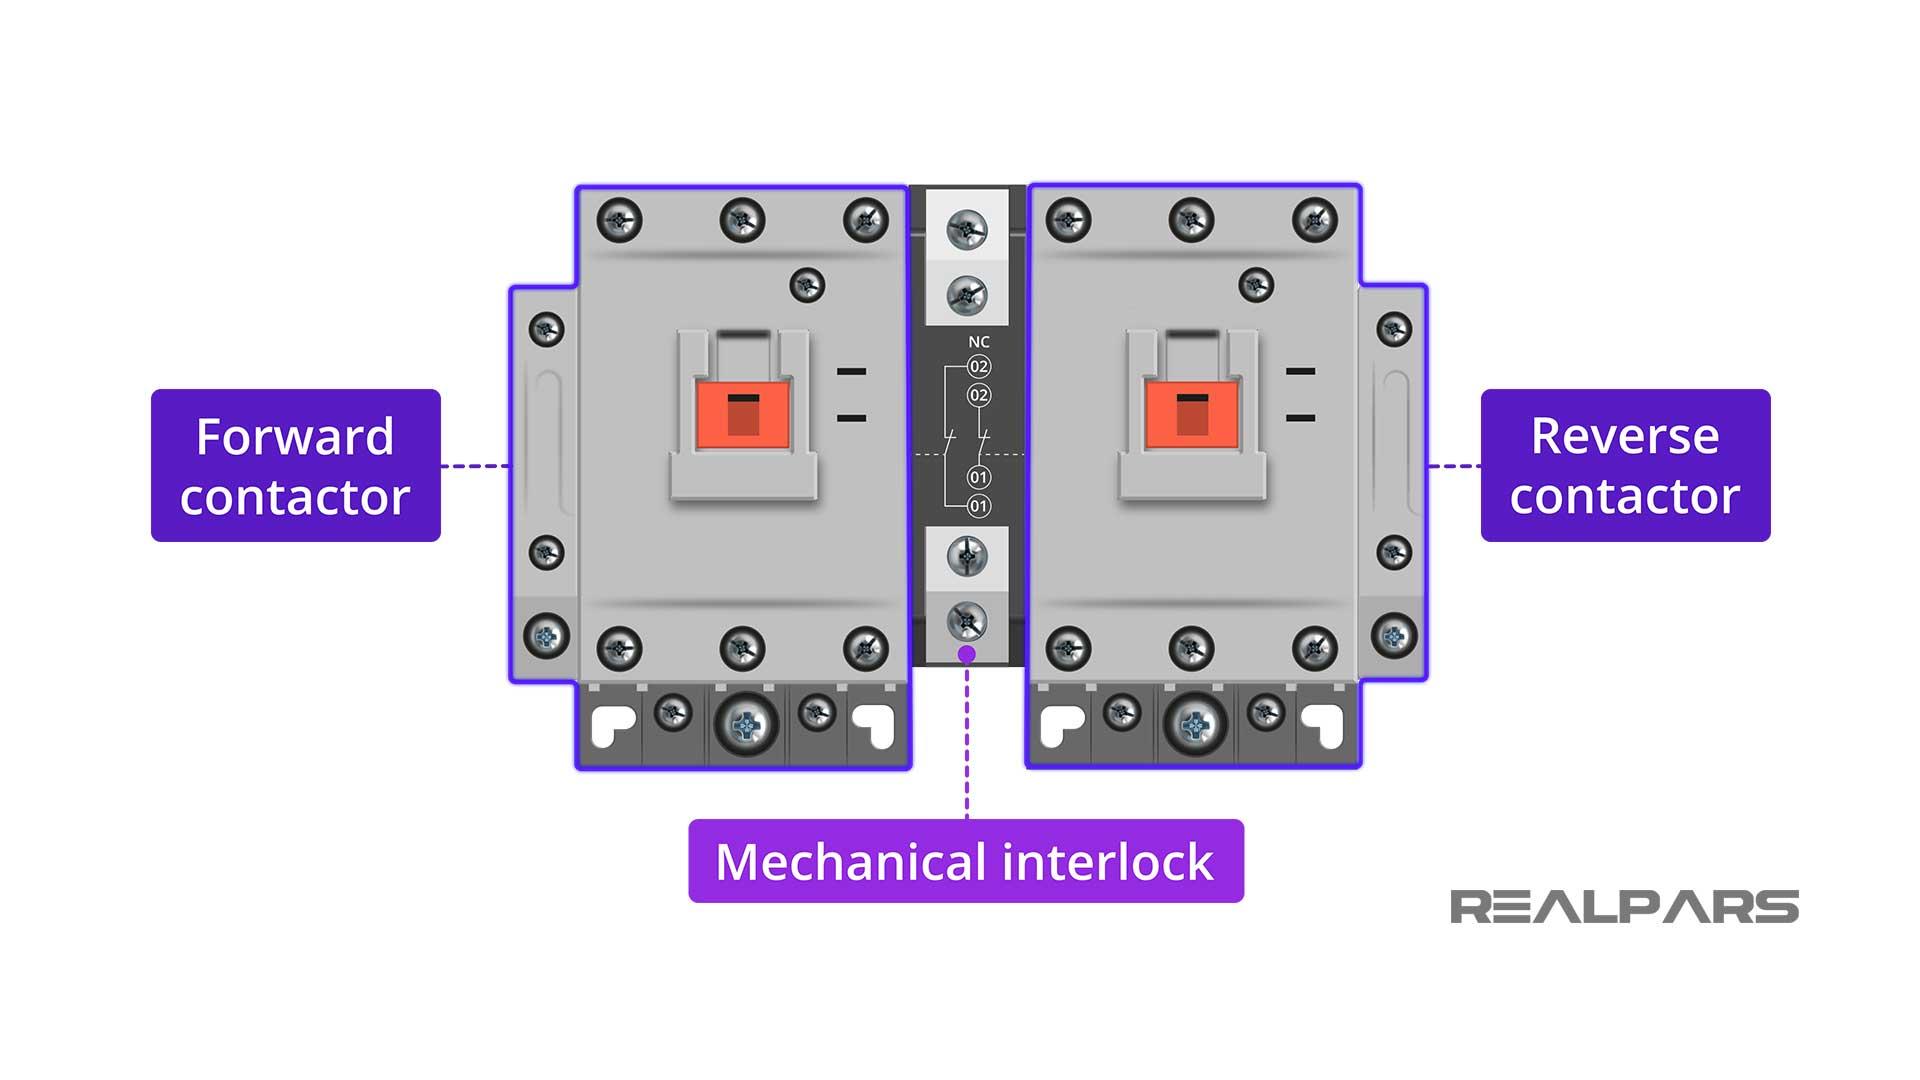 Mechanical-interlock